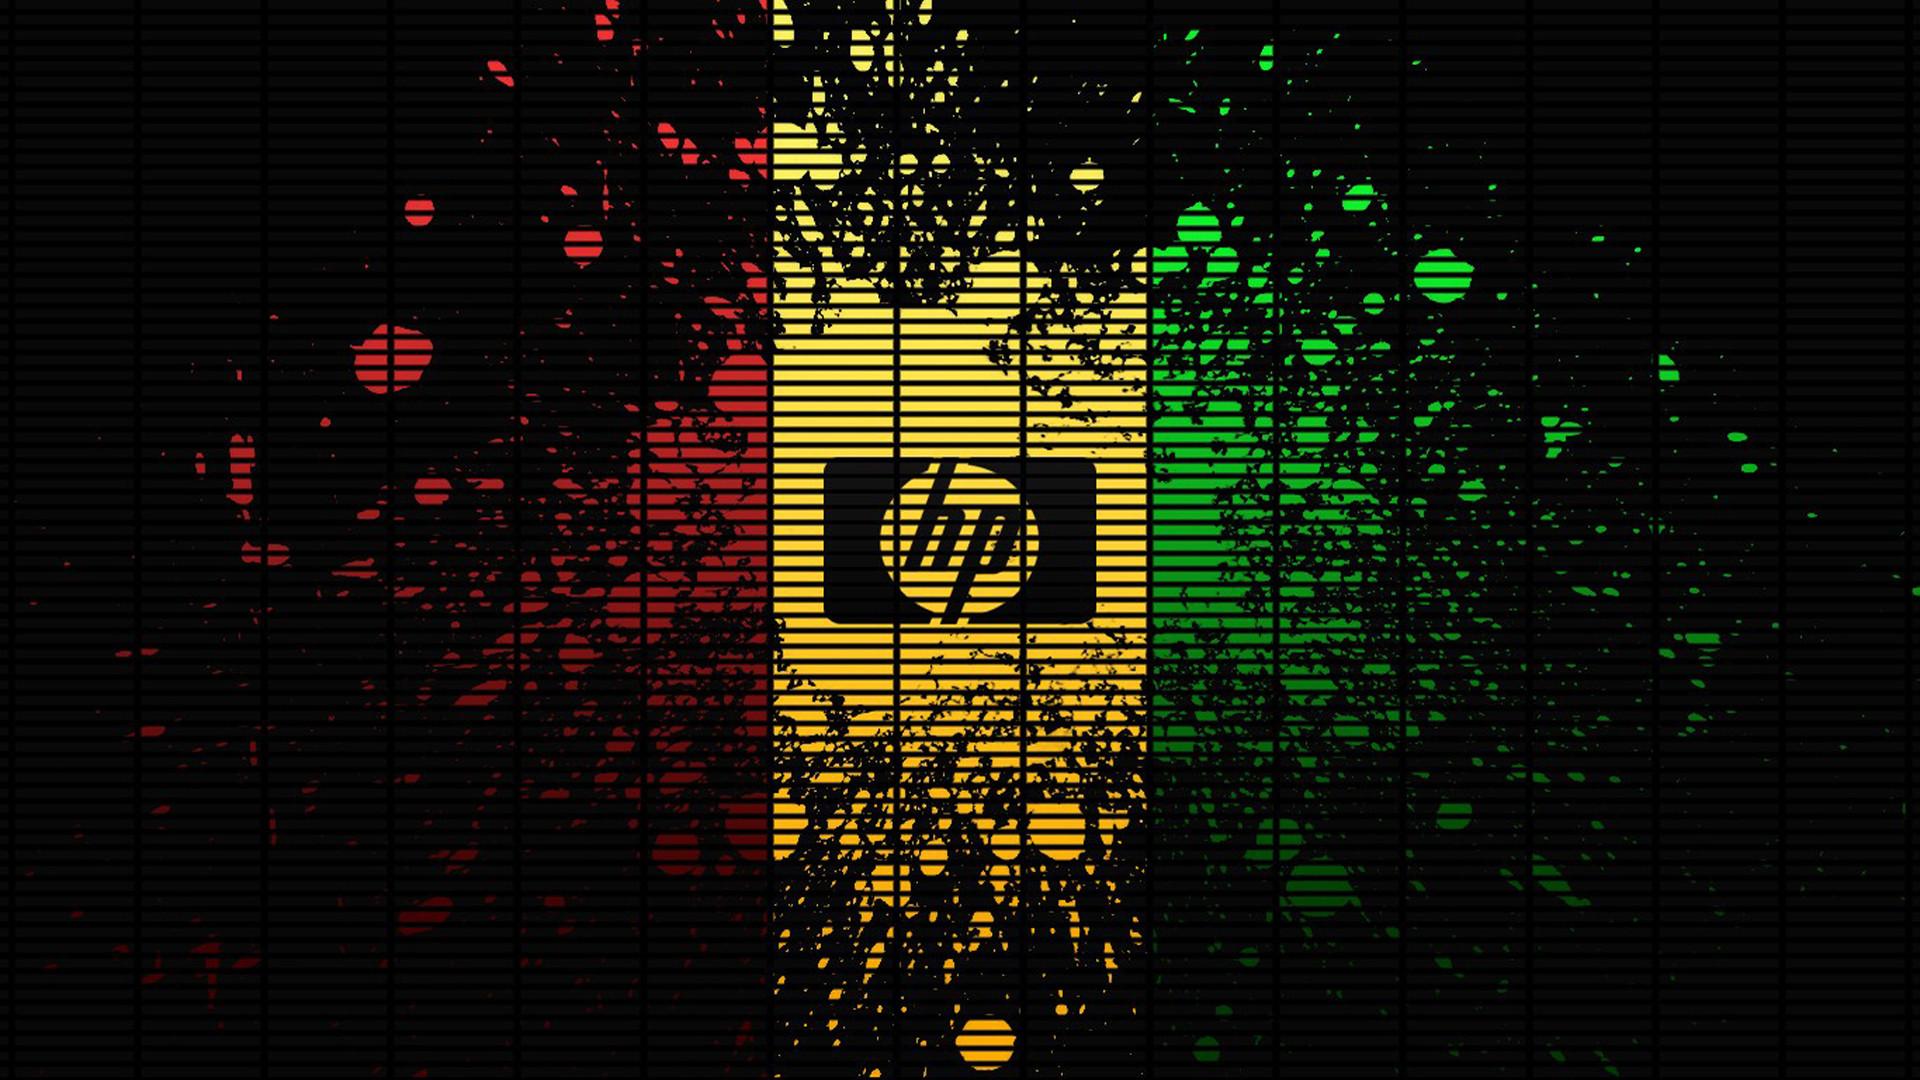 HP Desktop Background 1